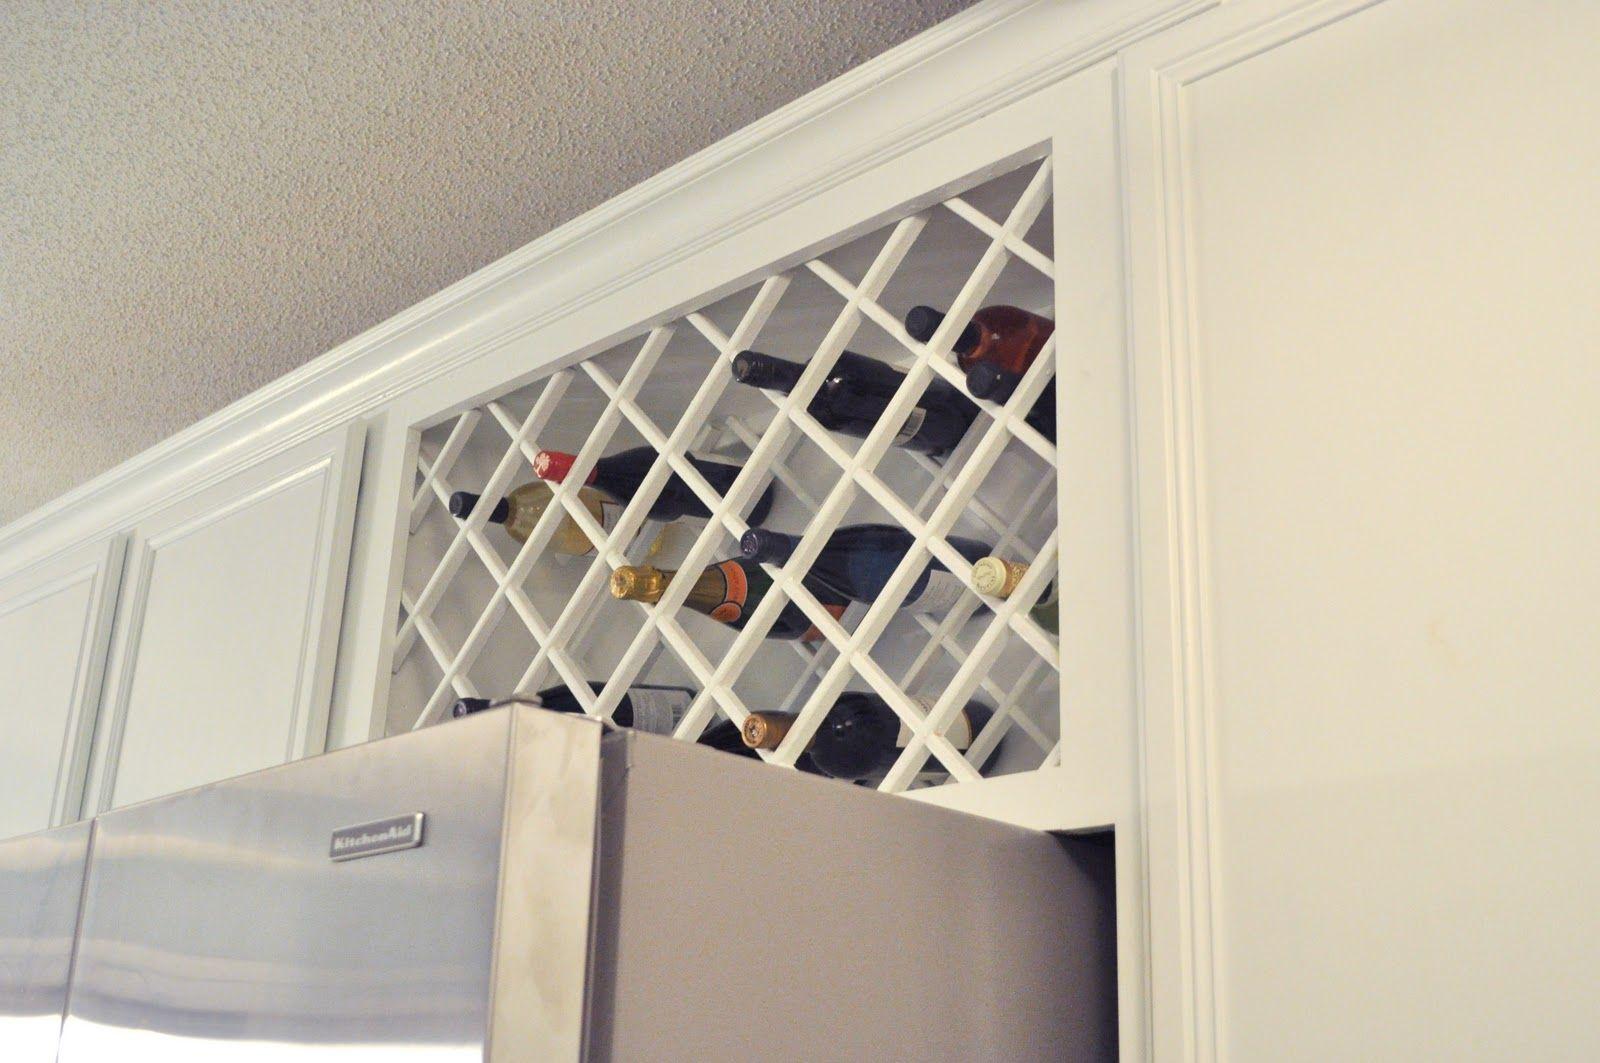 Install A Wine Rack Lattice Above The Refrigerator Hone